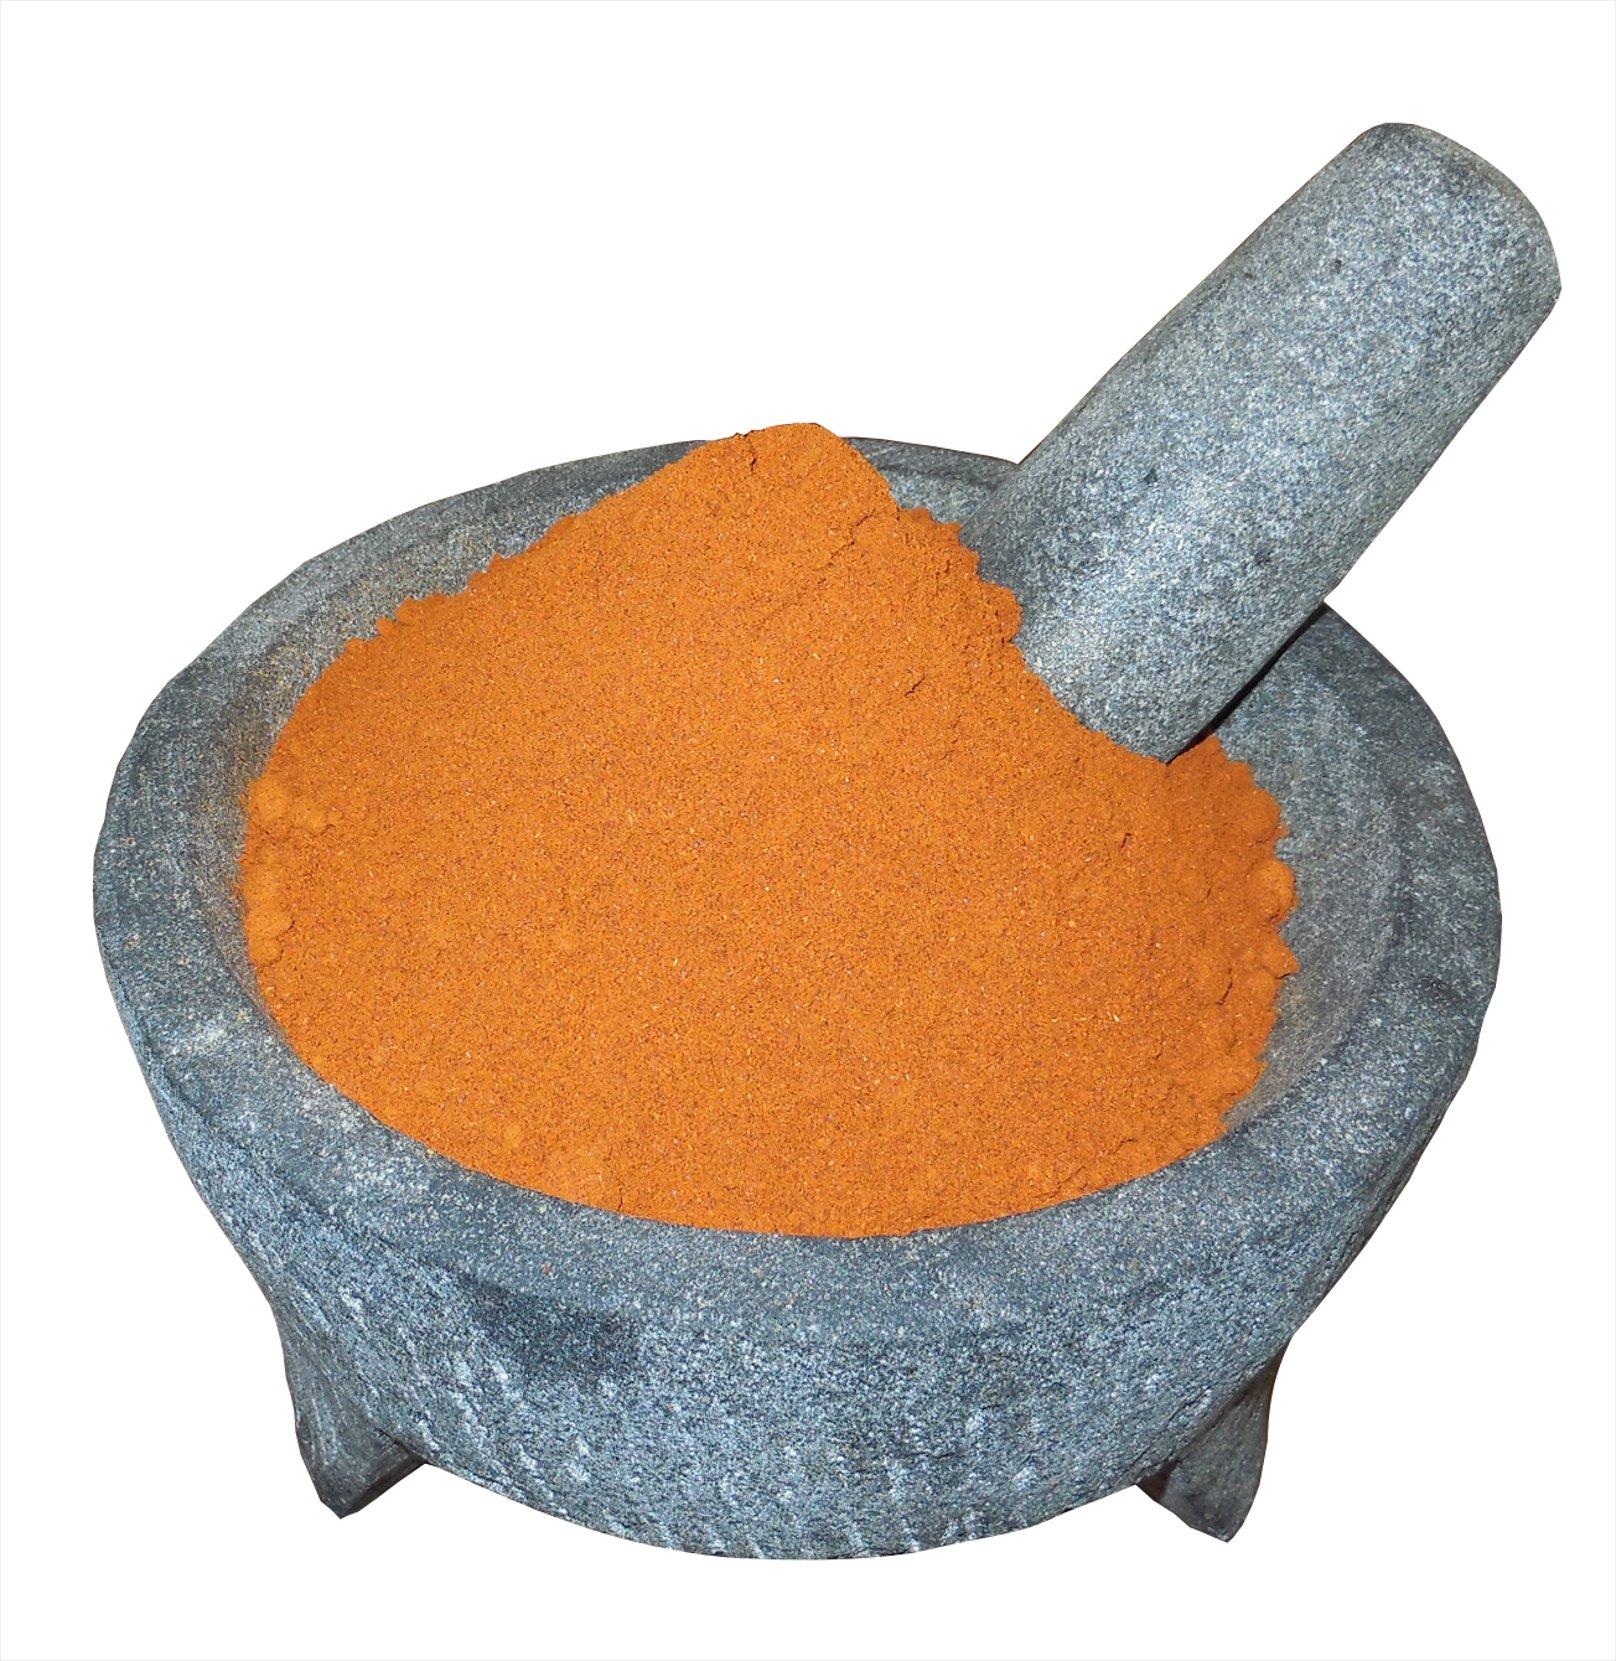 Meco Chipotle Powder 16oz for Sauces, Salsa, Pasta, Chili, Meat, Pizza